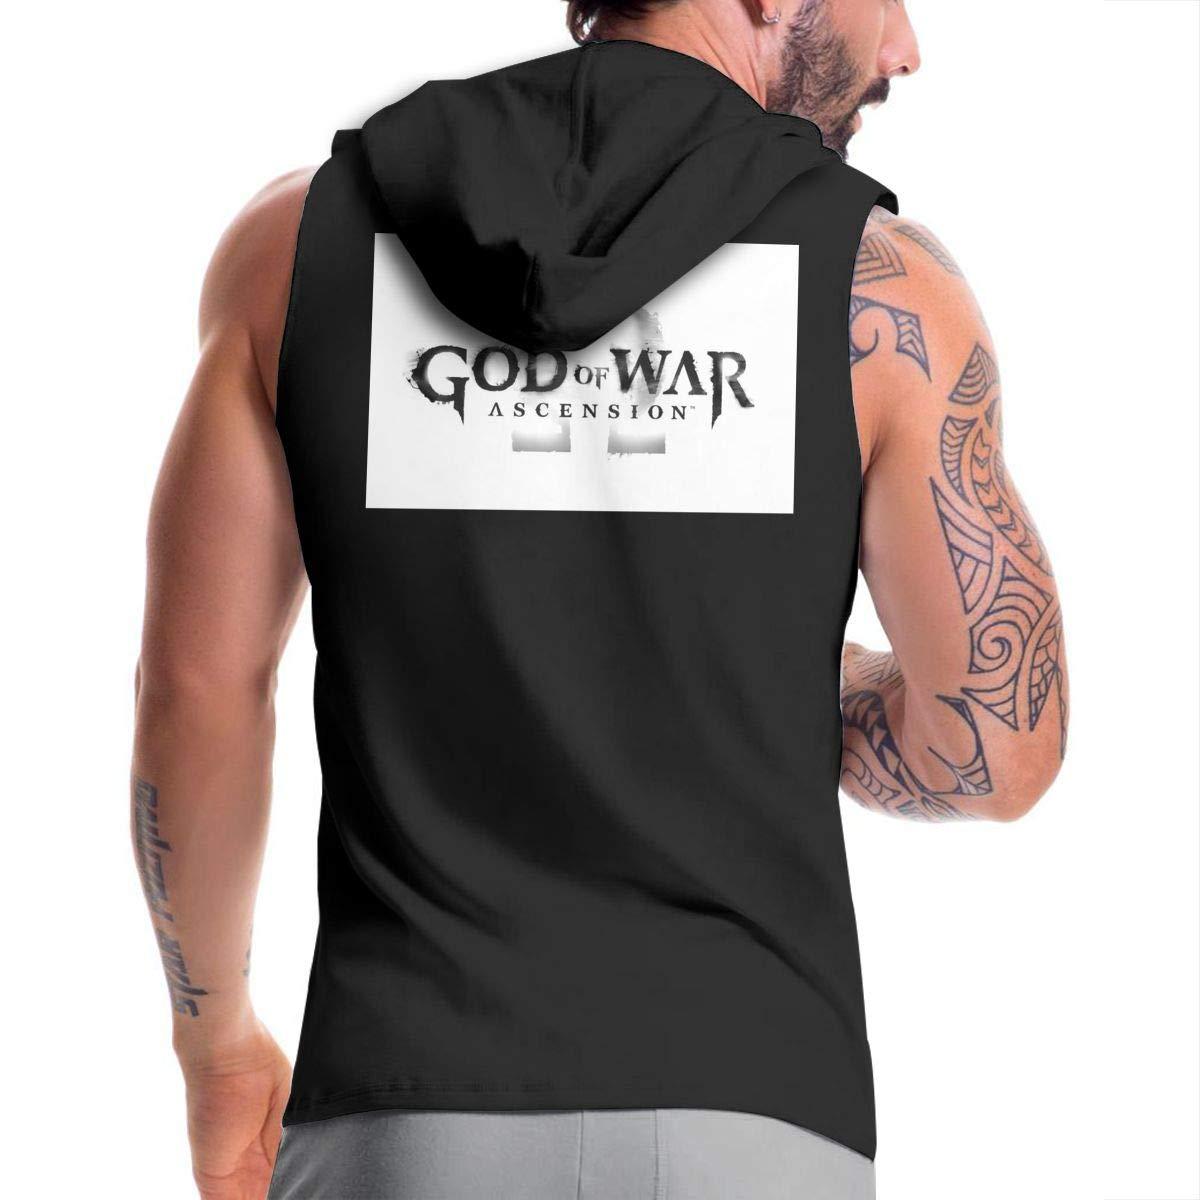 Kinggo Personalized Man with Hood Sack God of War Ascension Casual Zipper Sweatshirt